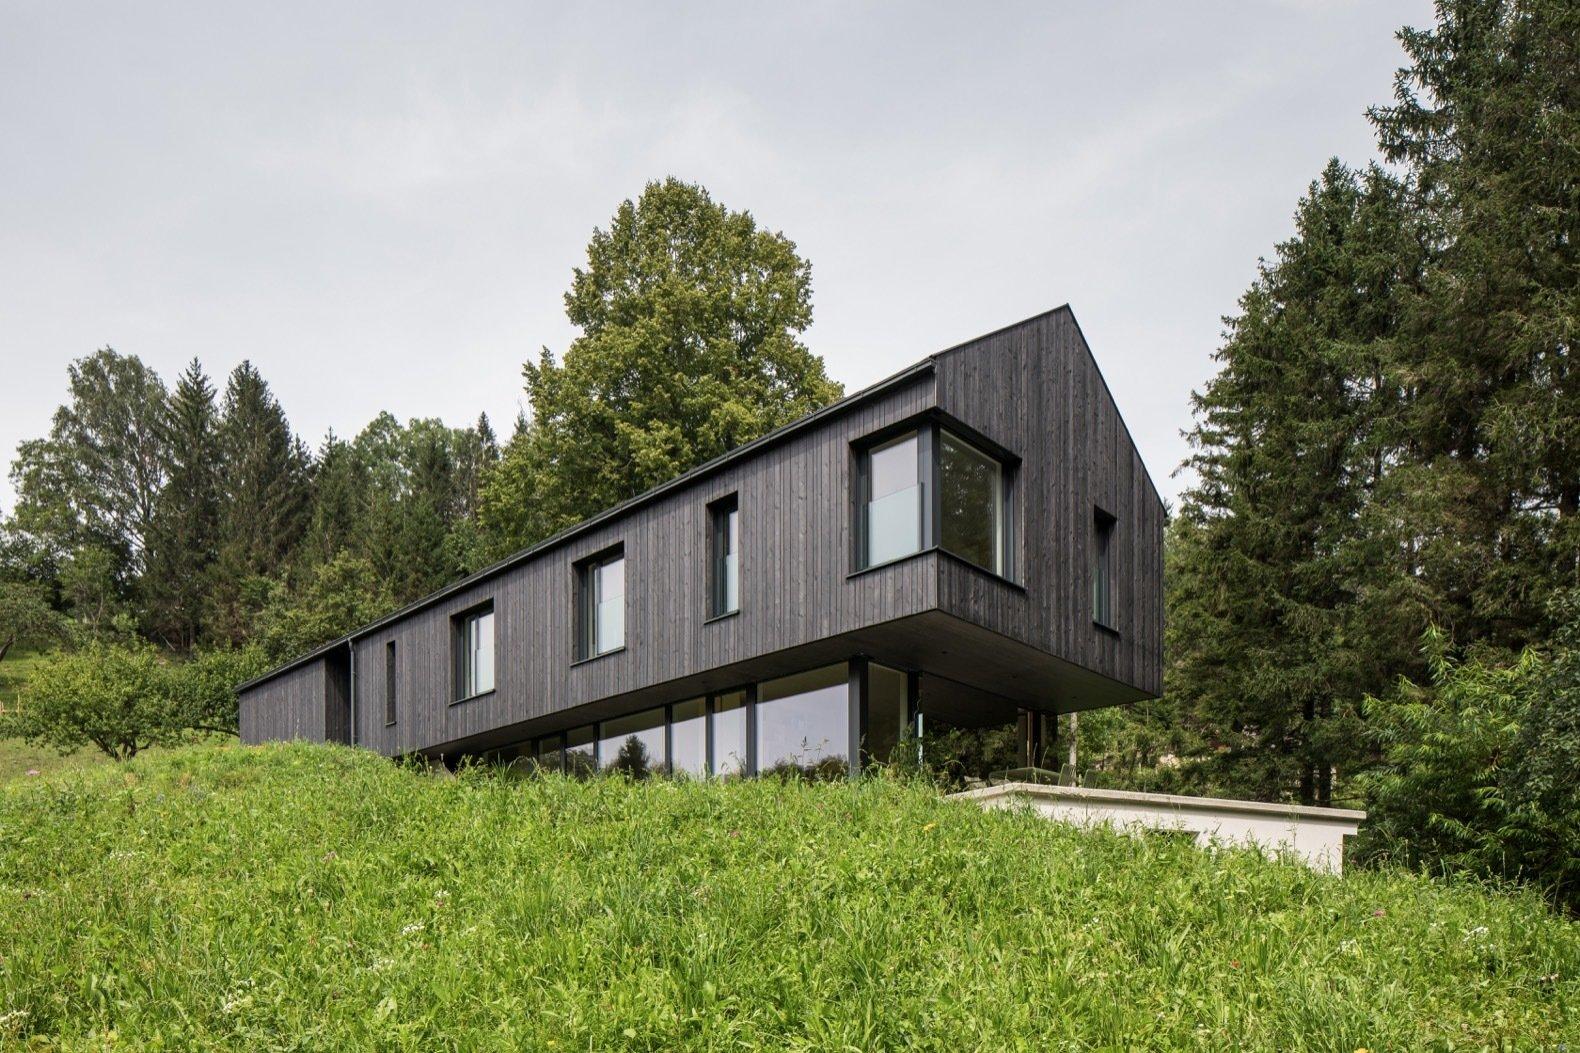 Mountain House by Sigurd Larsen